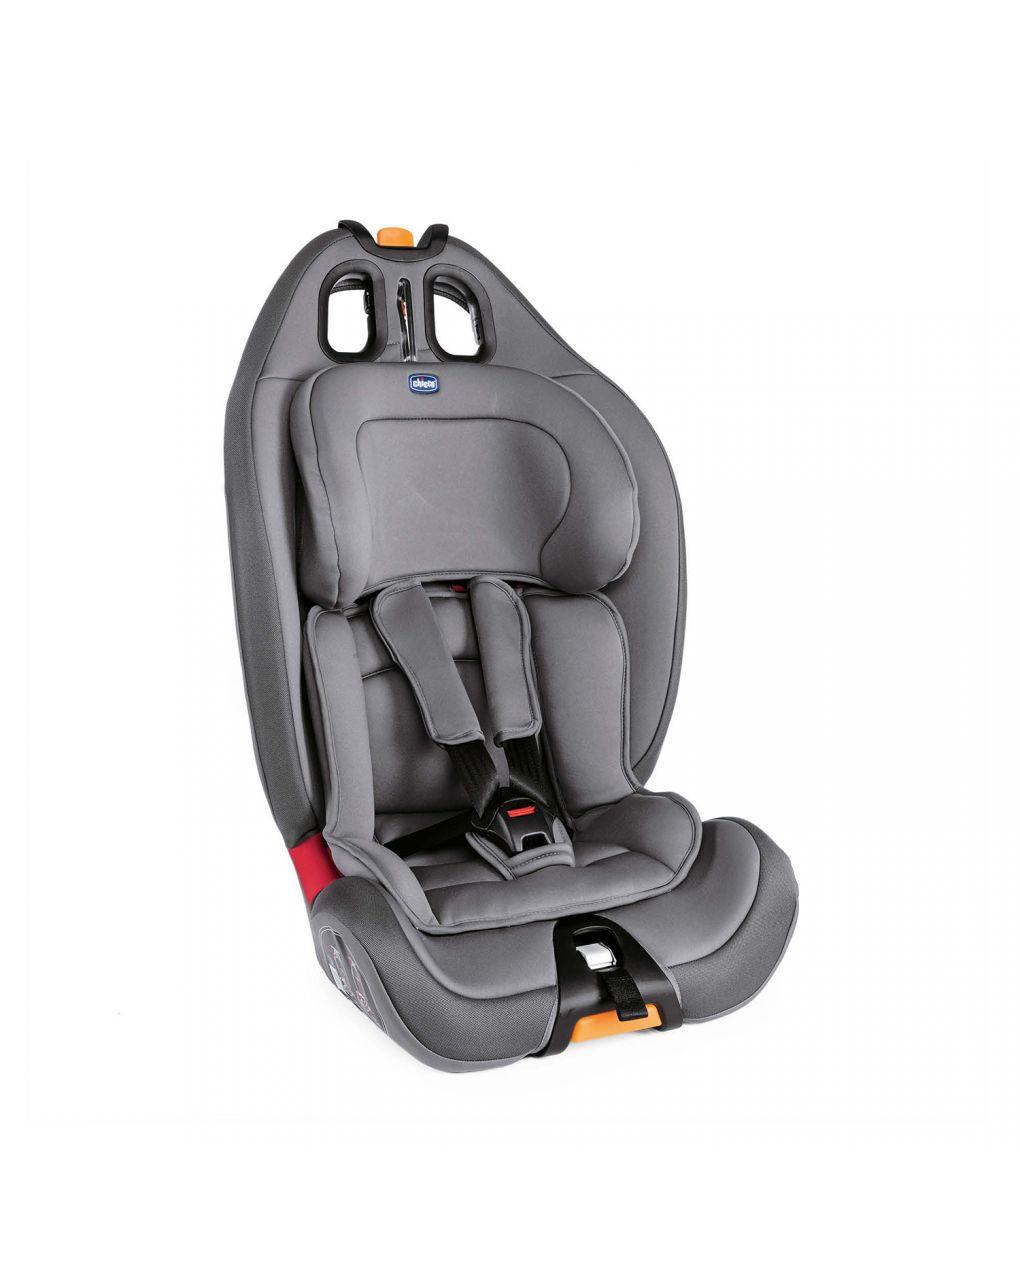 Chicco Gro-Up 123 Kάθισμα Aυτοκινήτου - Περλε